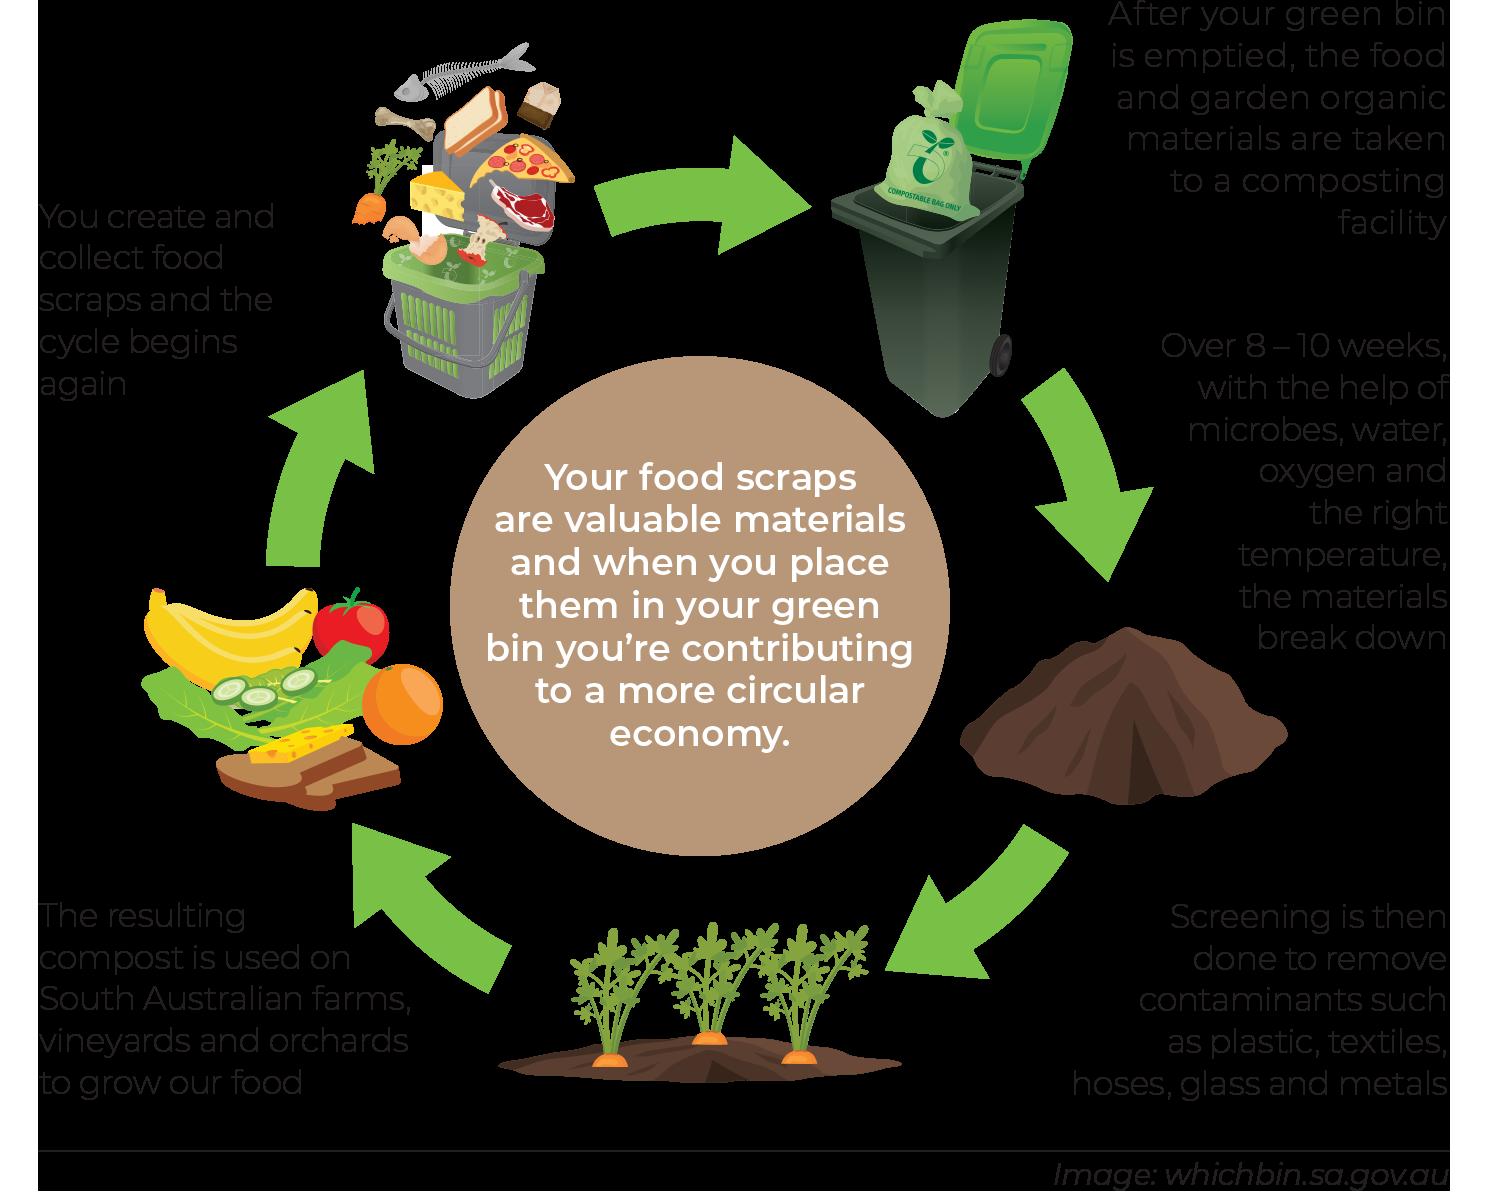 Organics recycling process